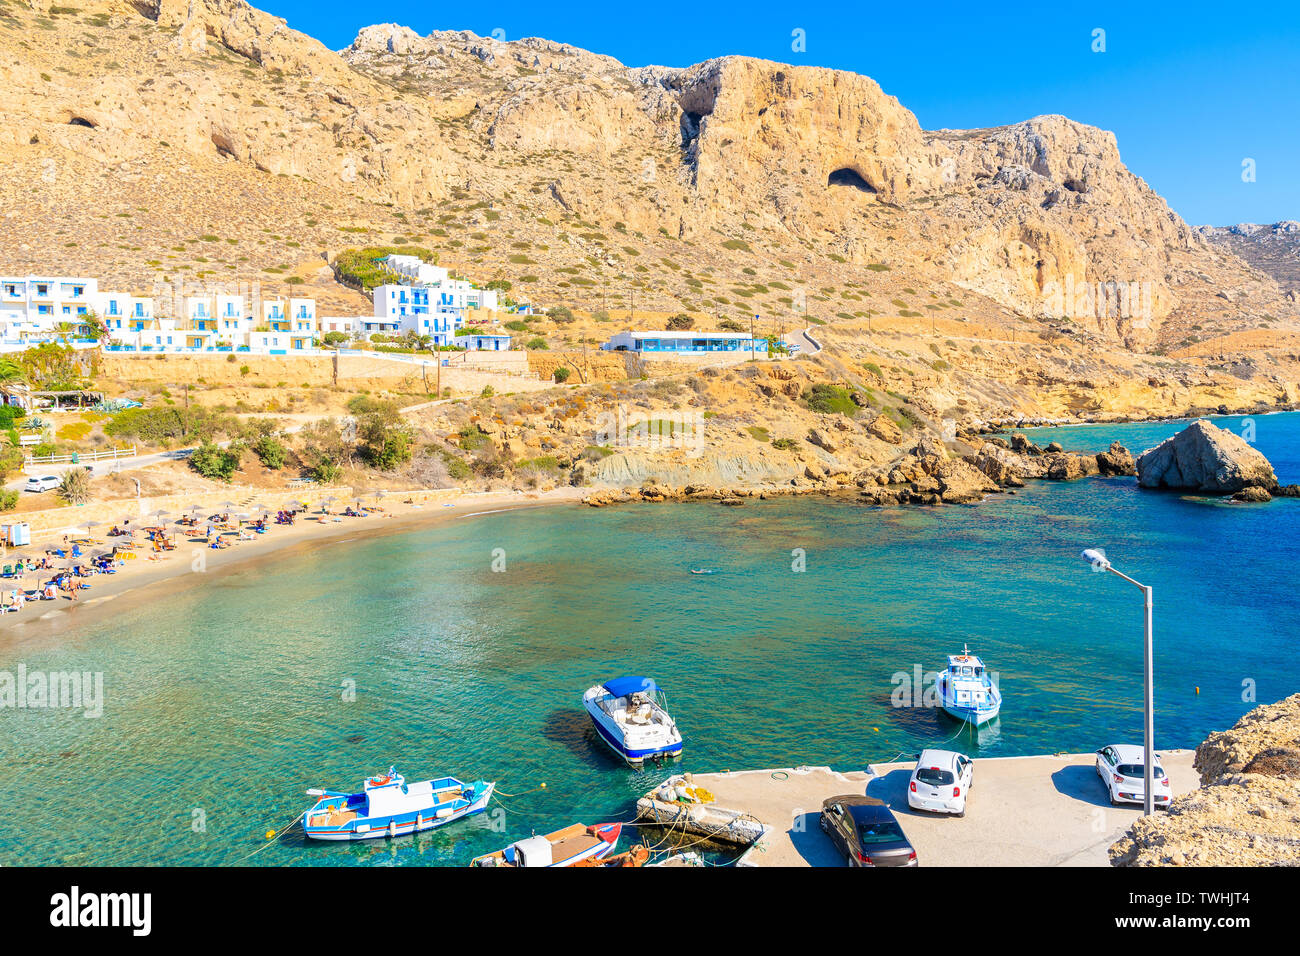 Fishing boats on turquoise sea water in Finiki port, Karpathos island, Greece Stock Photo